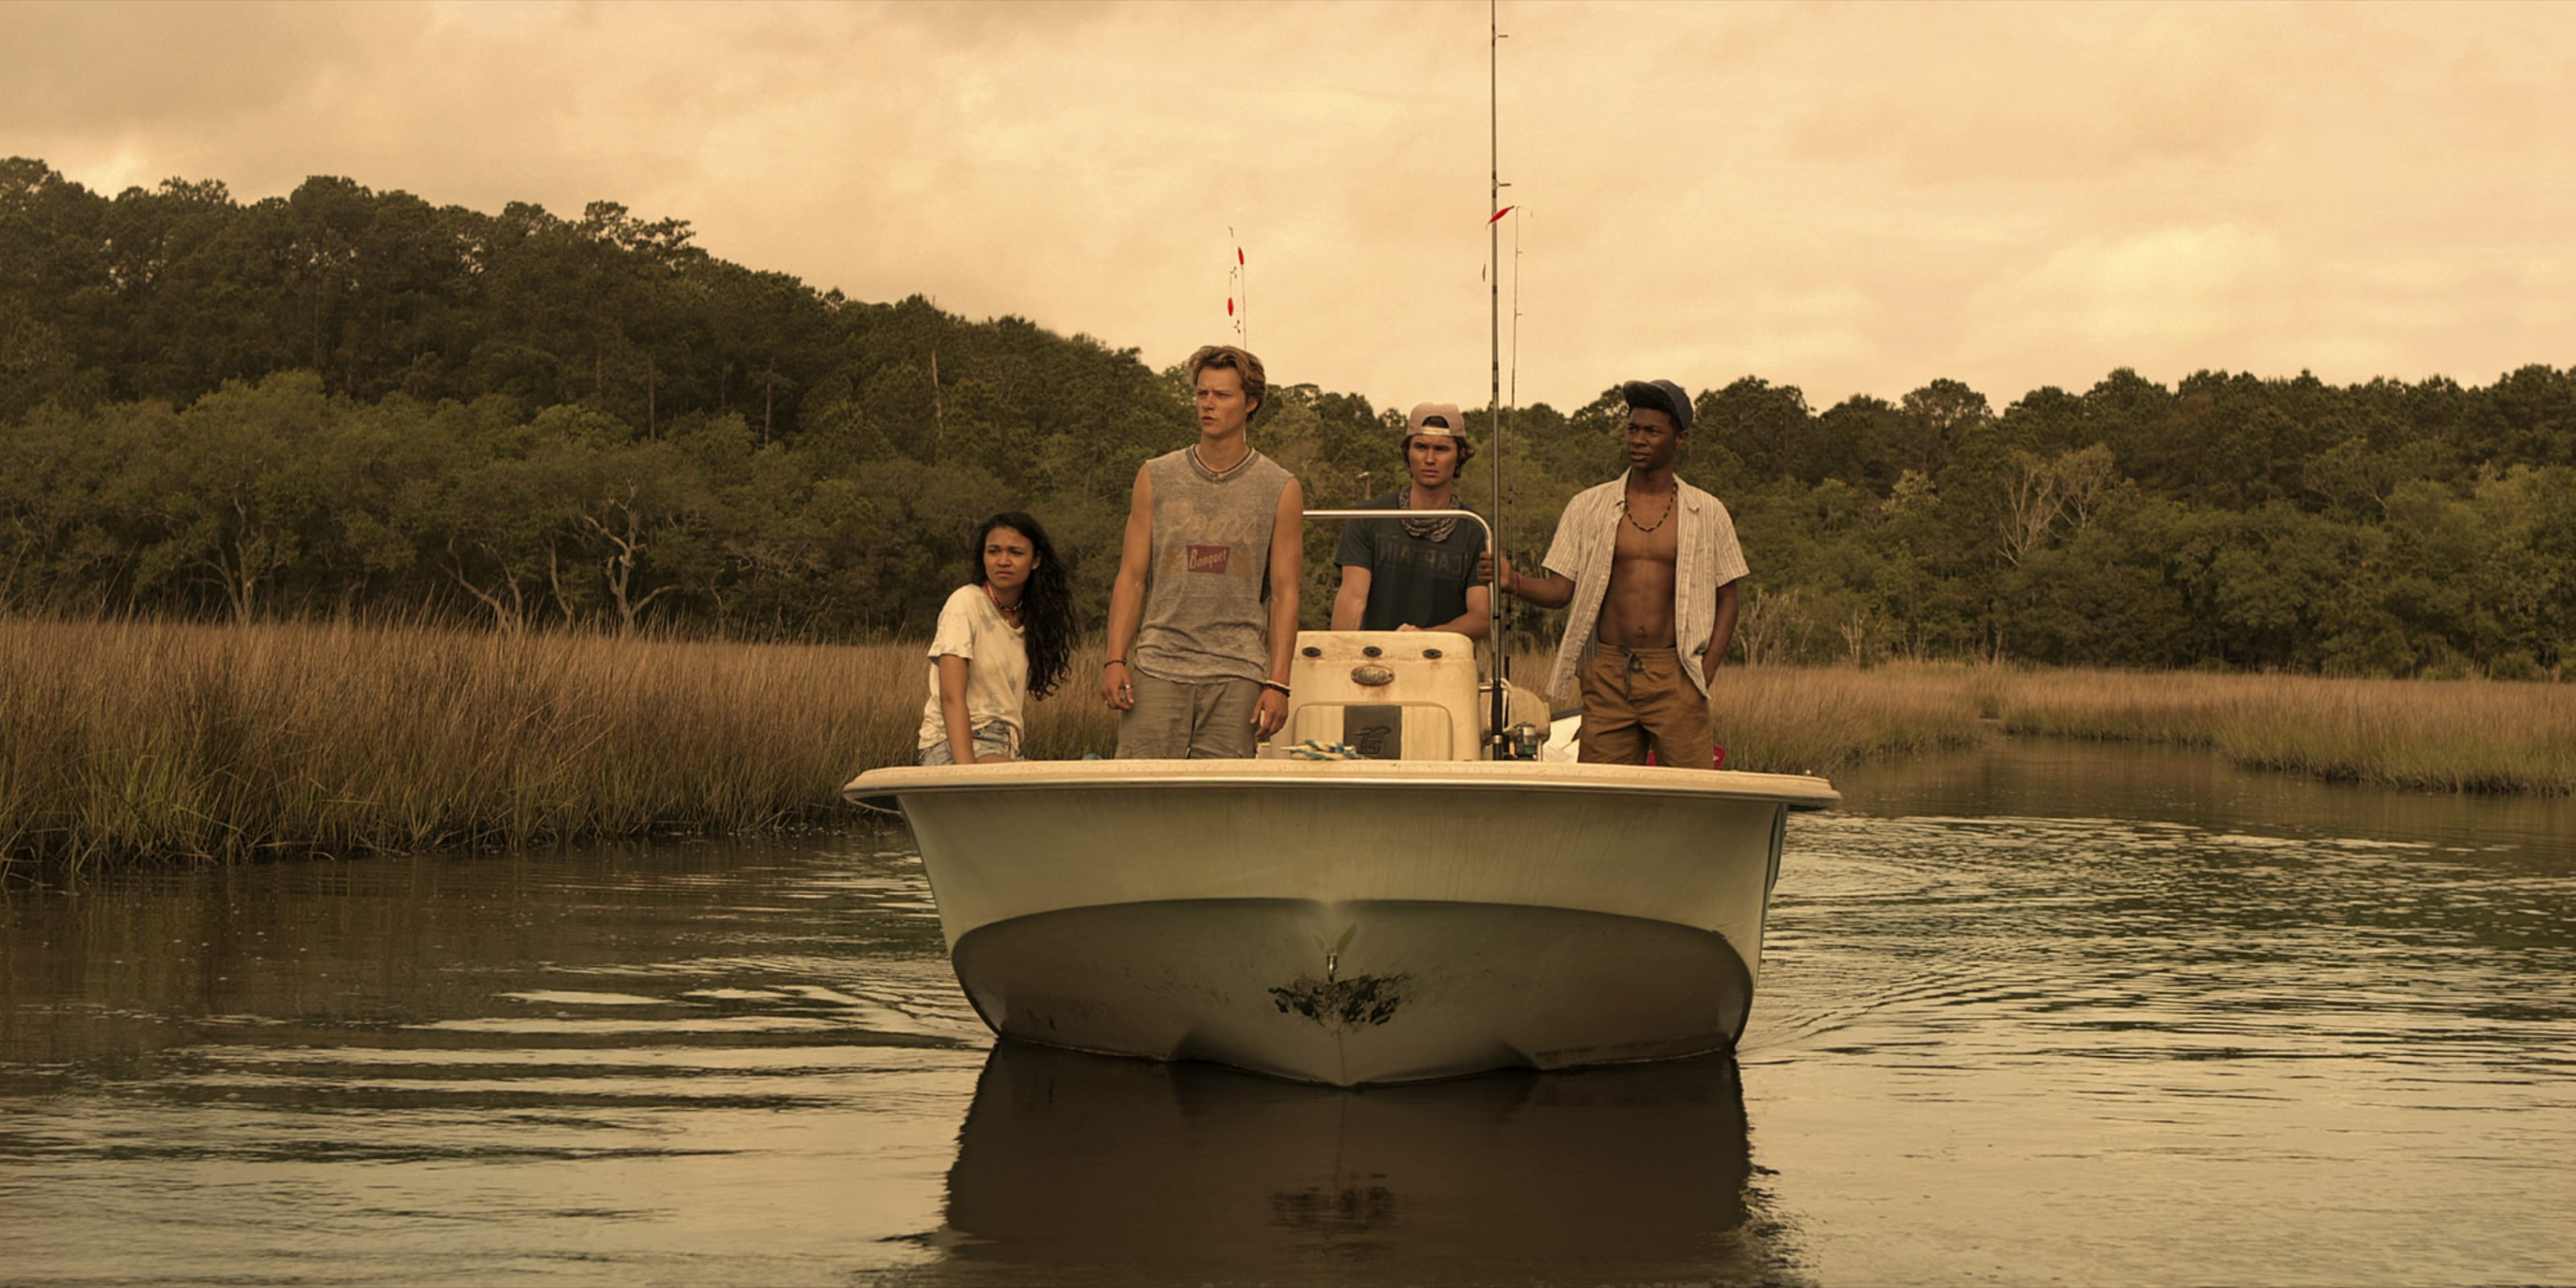 Outer Banks Season 1